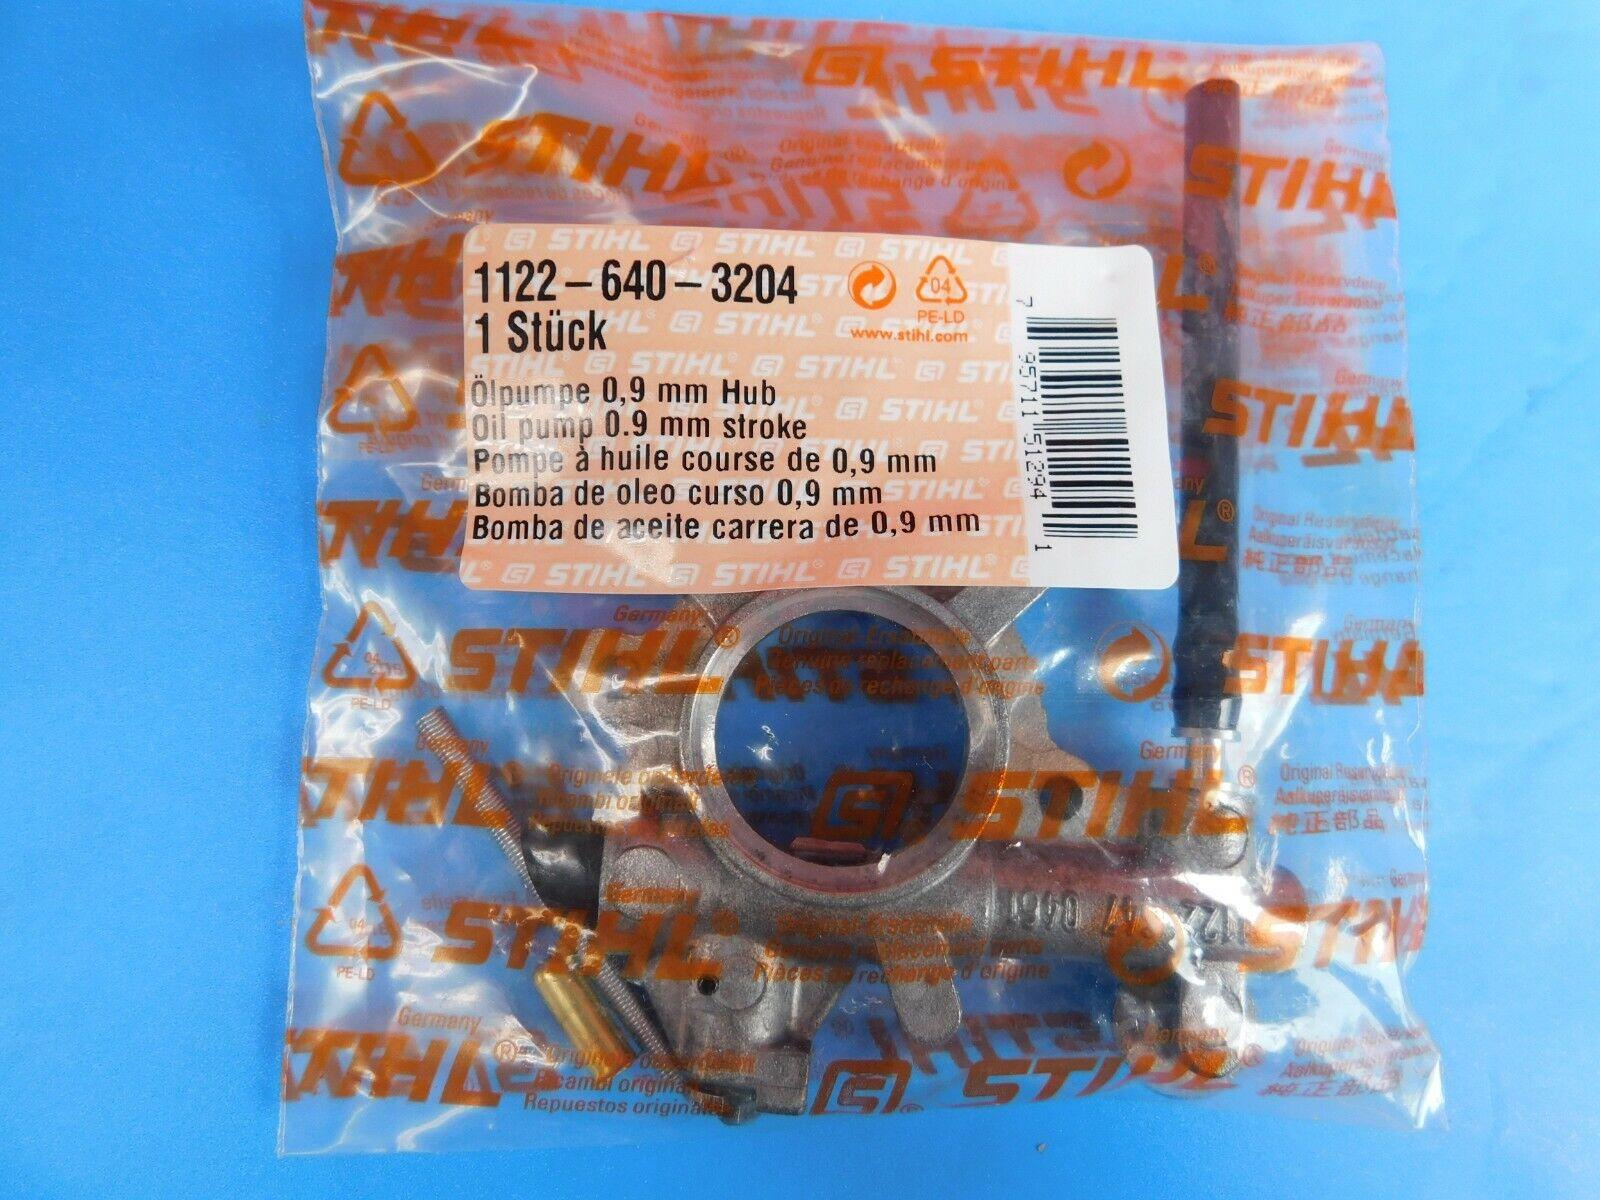 Stihl Oil Pump For Stihl 064 MS640 New Original  1122 640 3204 11226403204